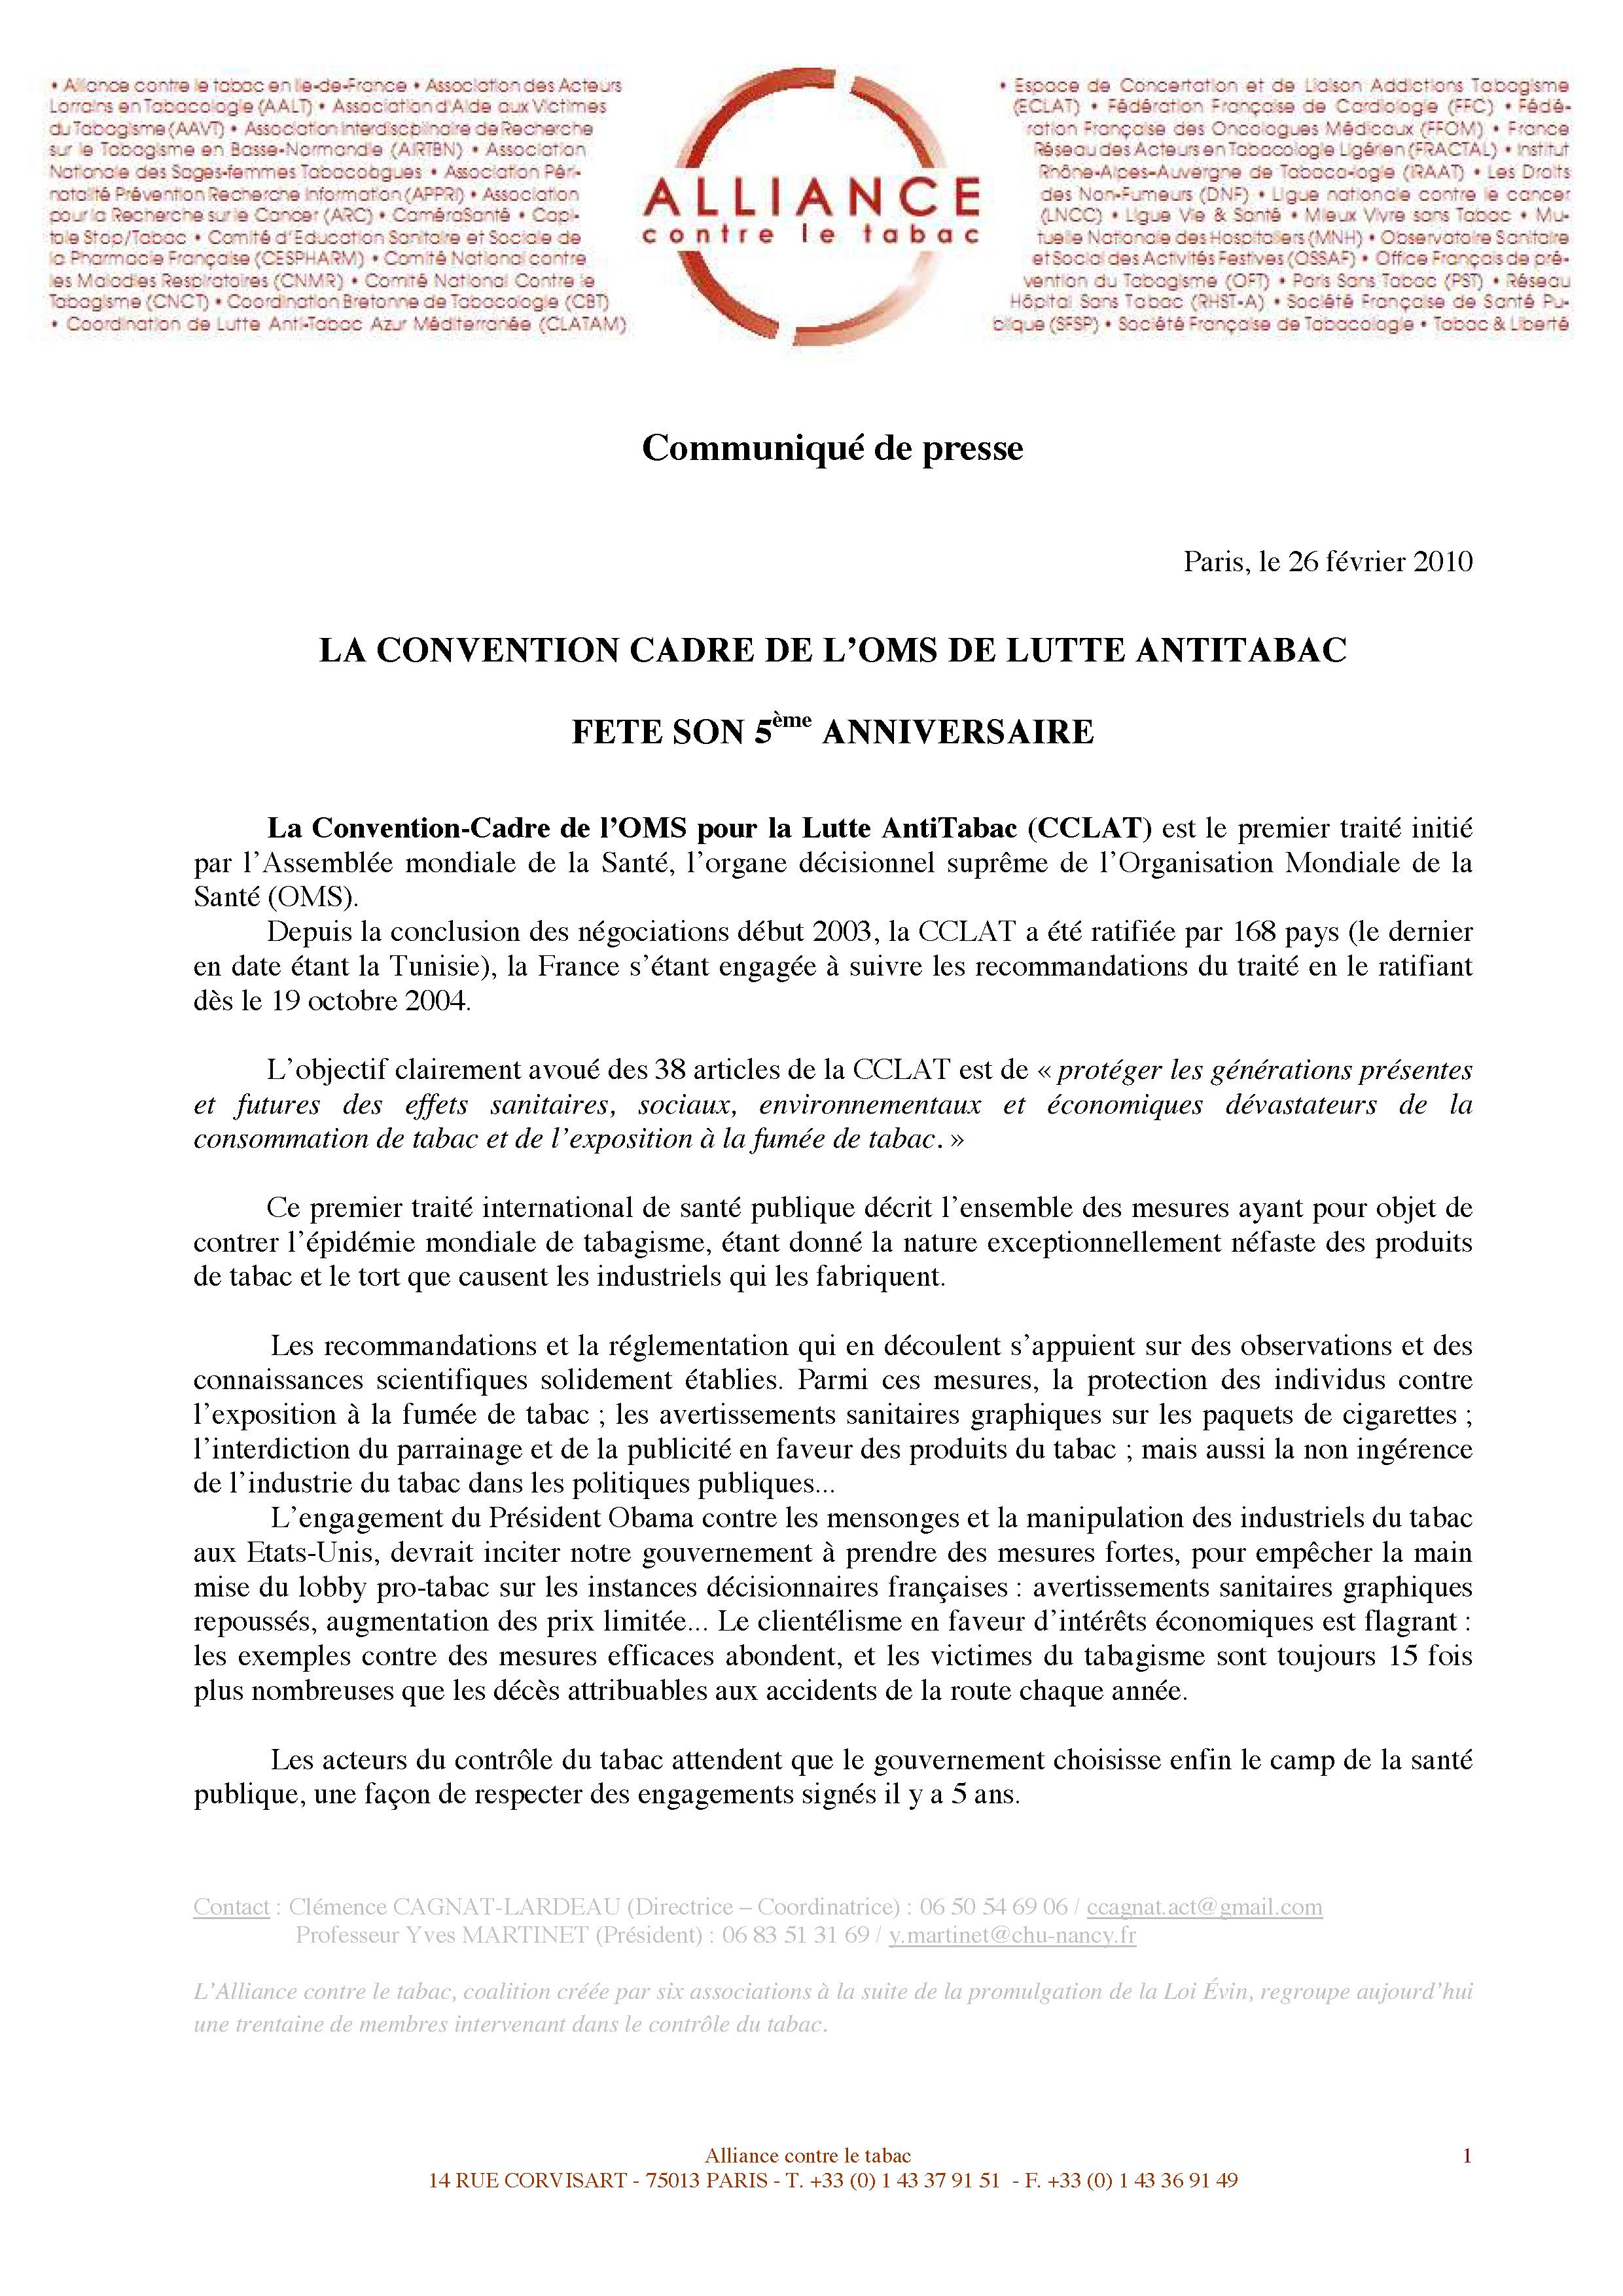 Alliance-CP_5eme-anniversaire-de-la-cclat-26fev2010.jpg